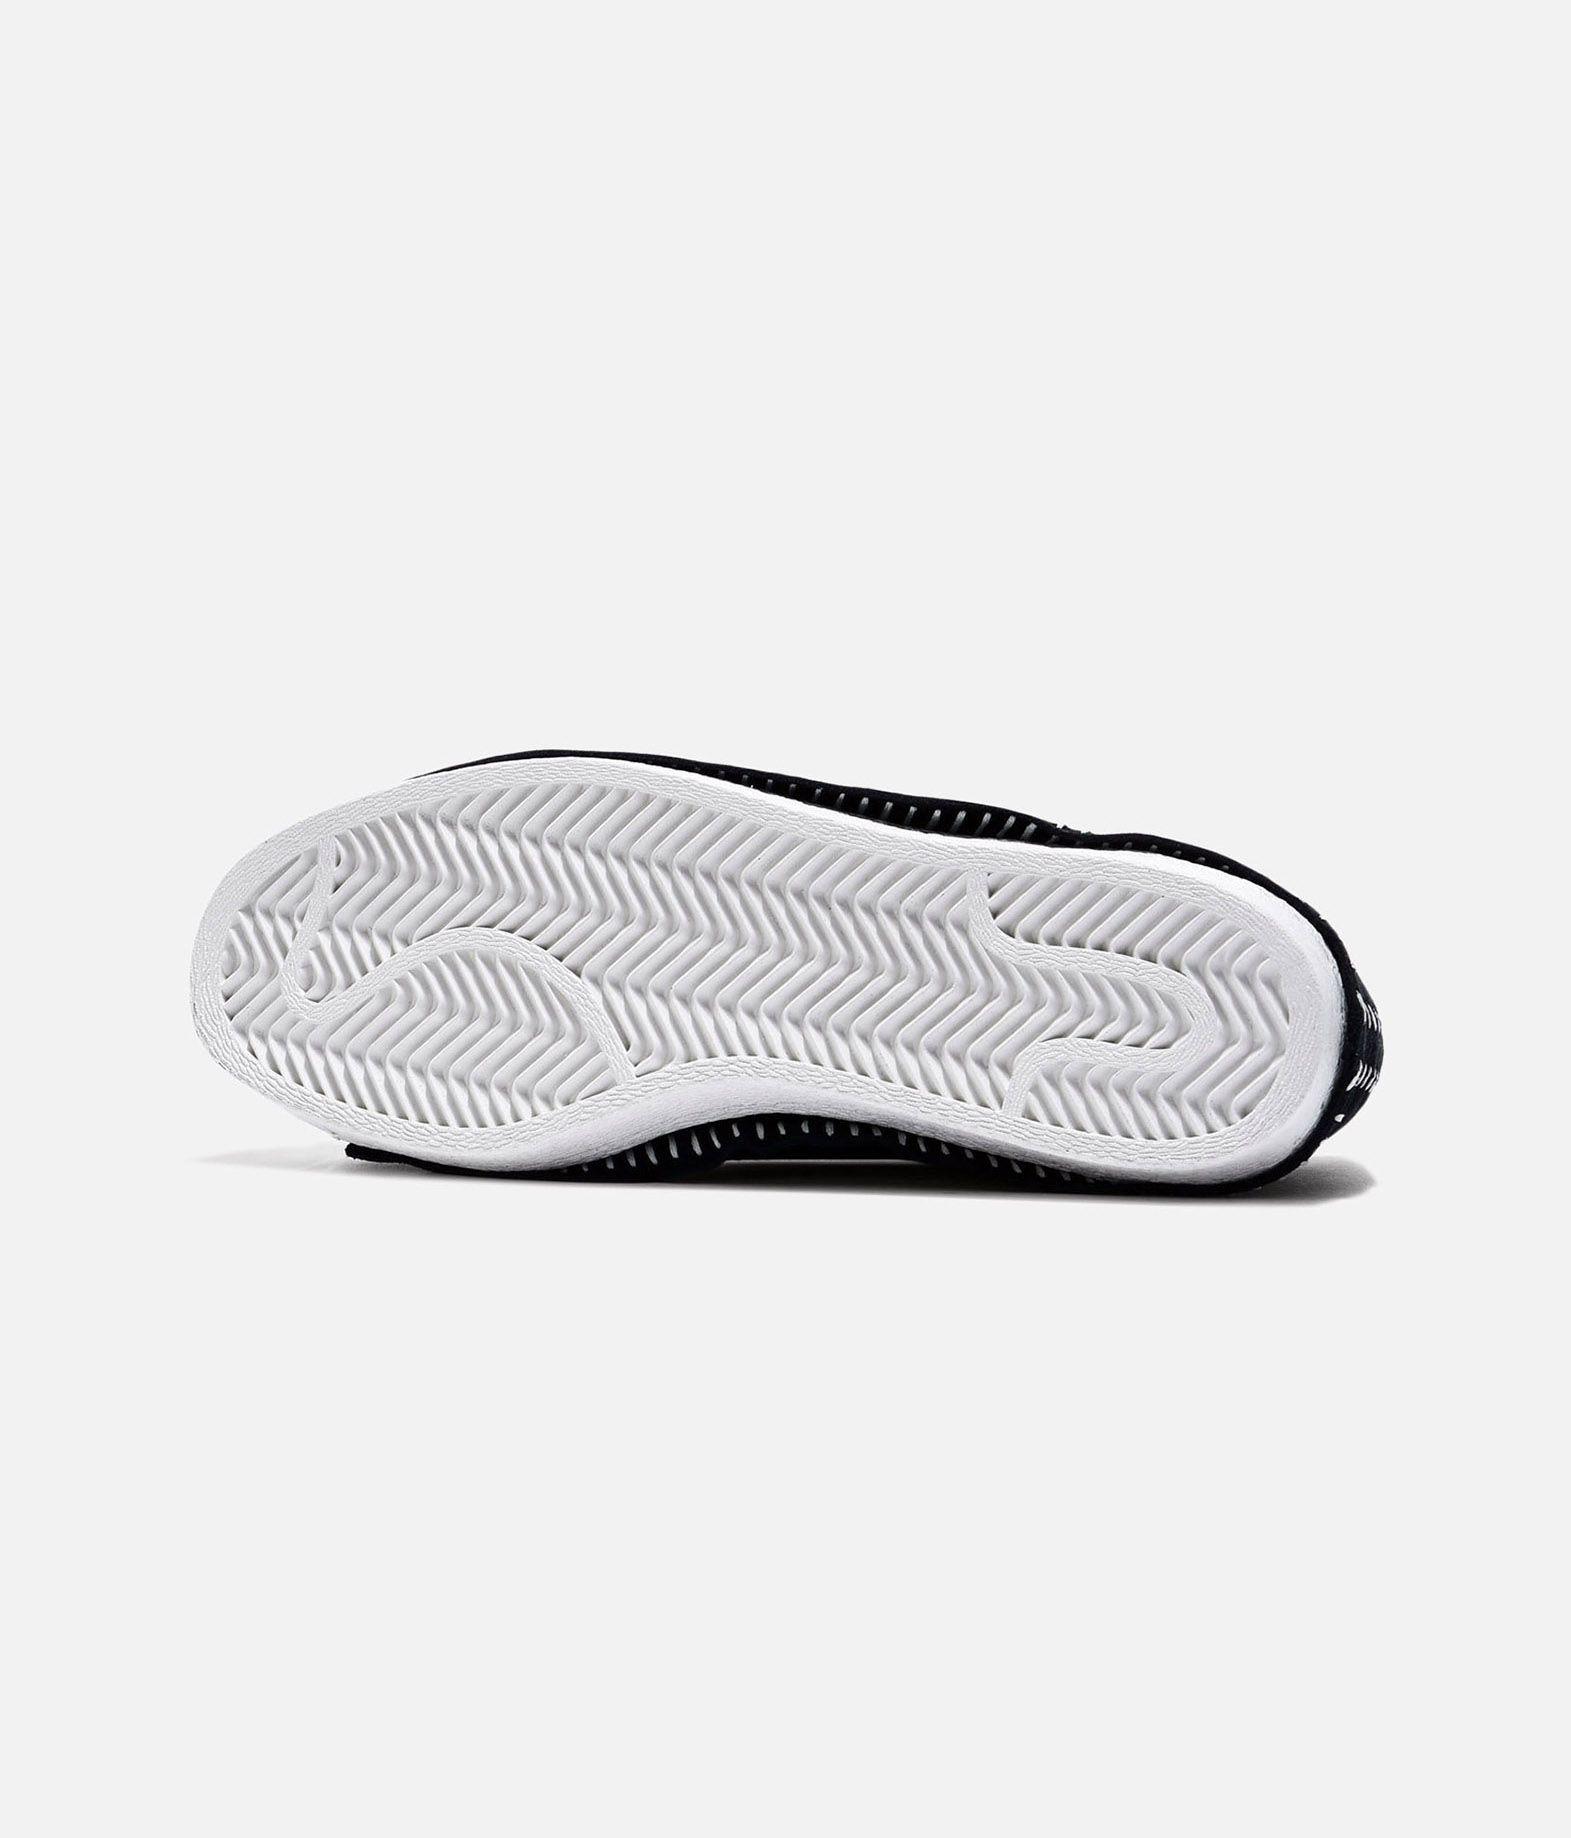 Y-3 Y-3 Bynder Super Sneakers E a